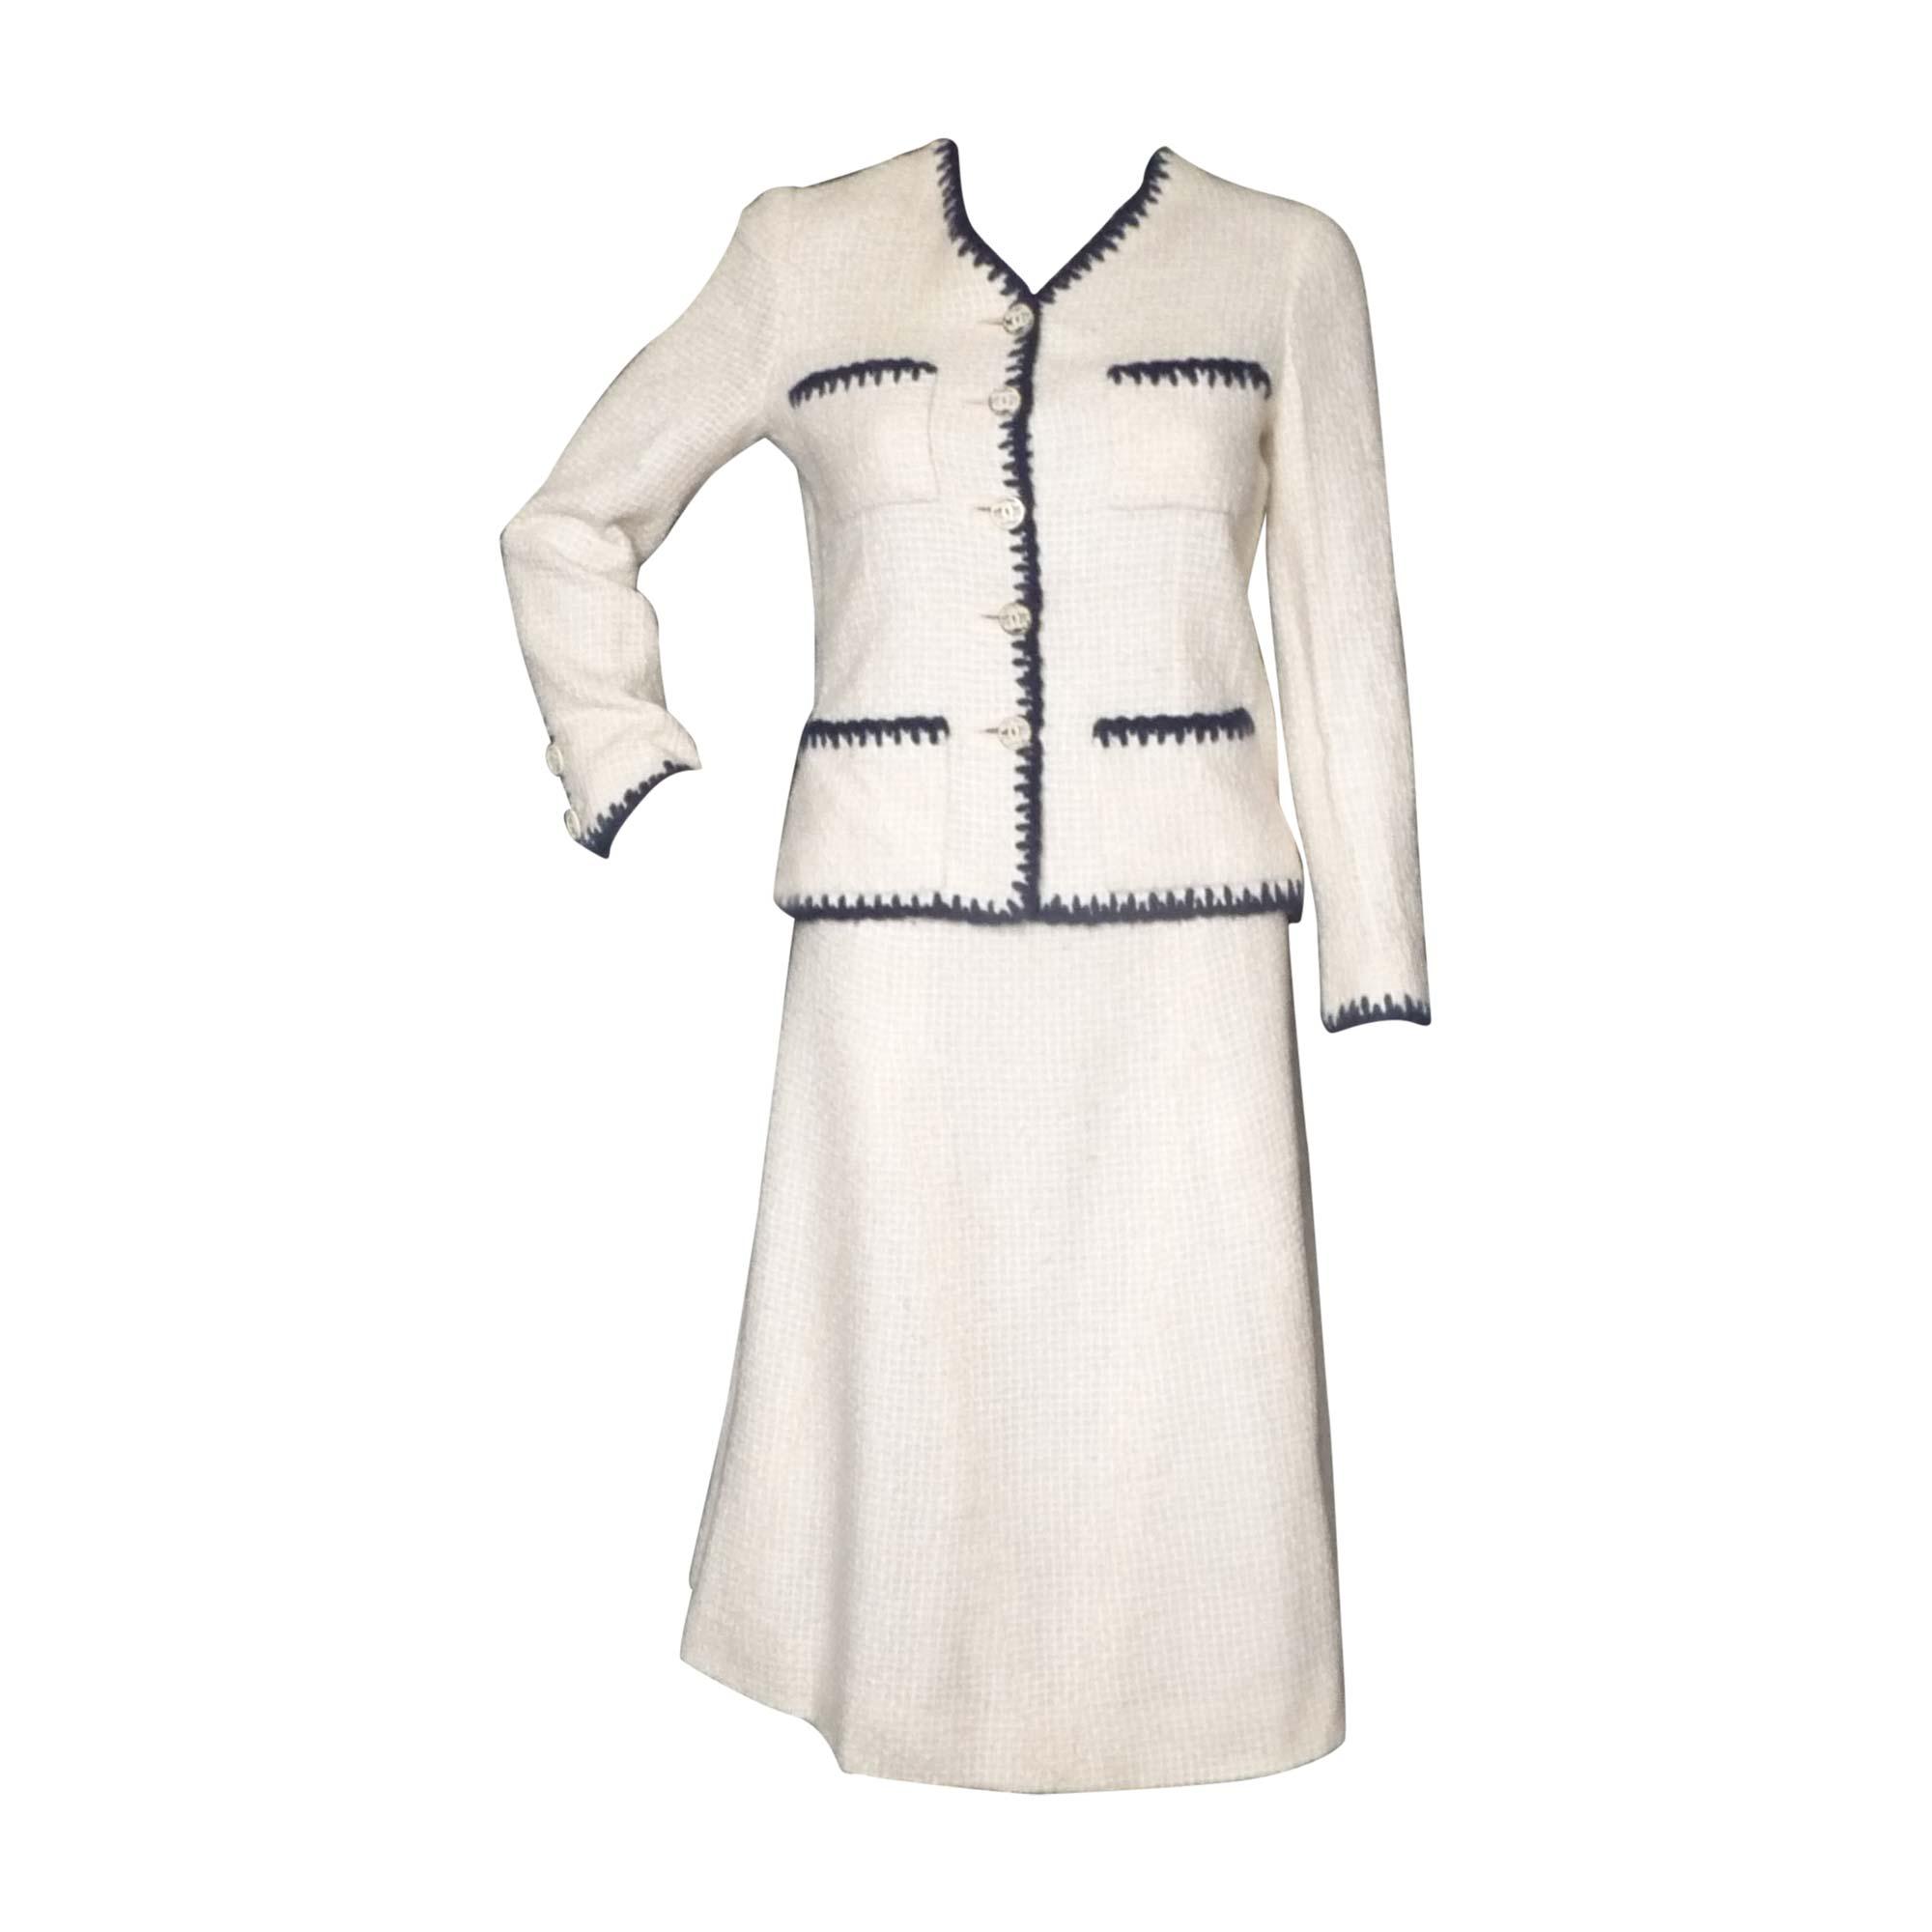 Tailleur jupe CHANEL 36 (S, T1) blanc - 7154486 aff0f5f8c4b